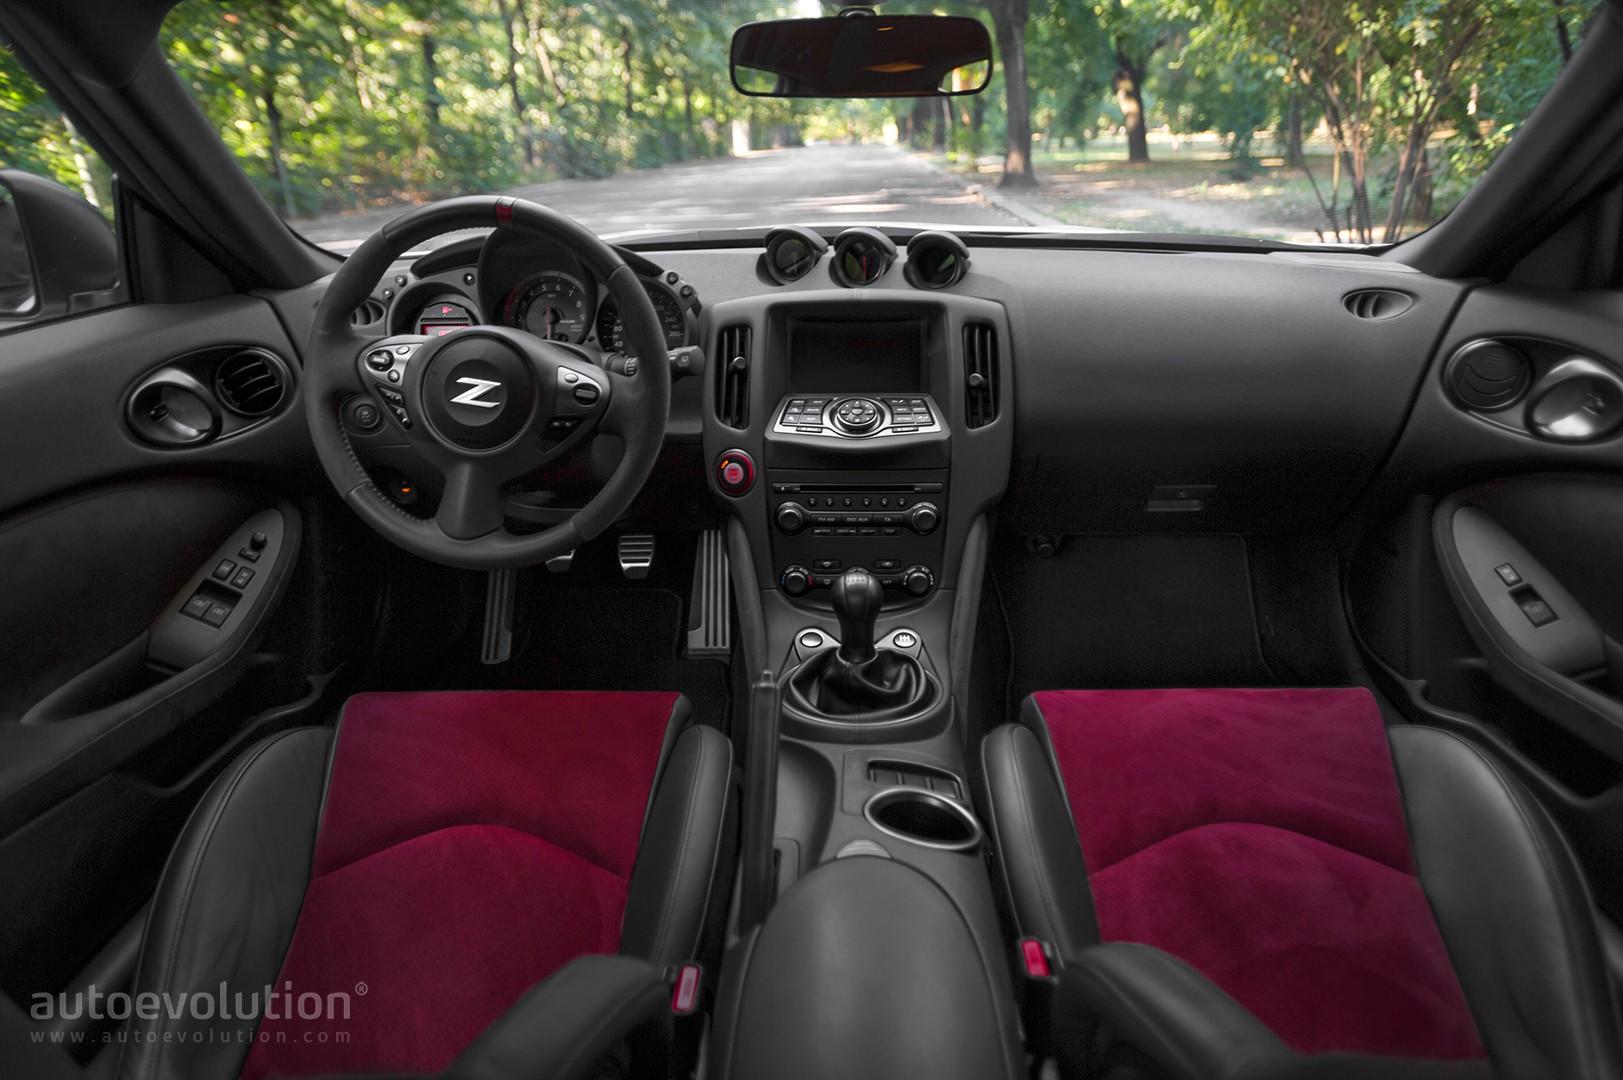 2016 nissan 370z nismo review - autoevolution